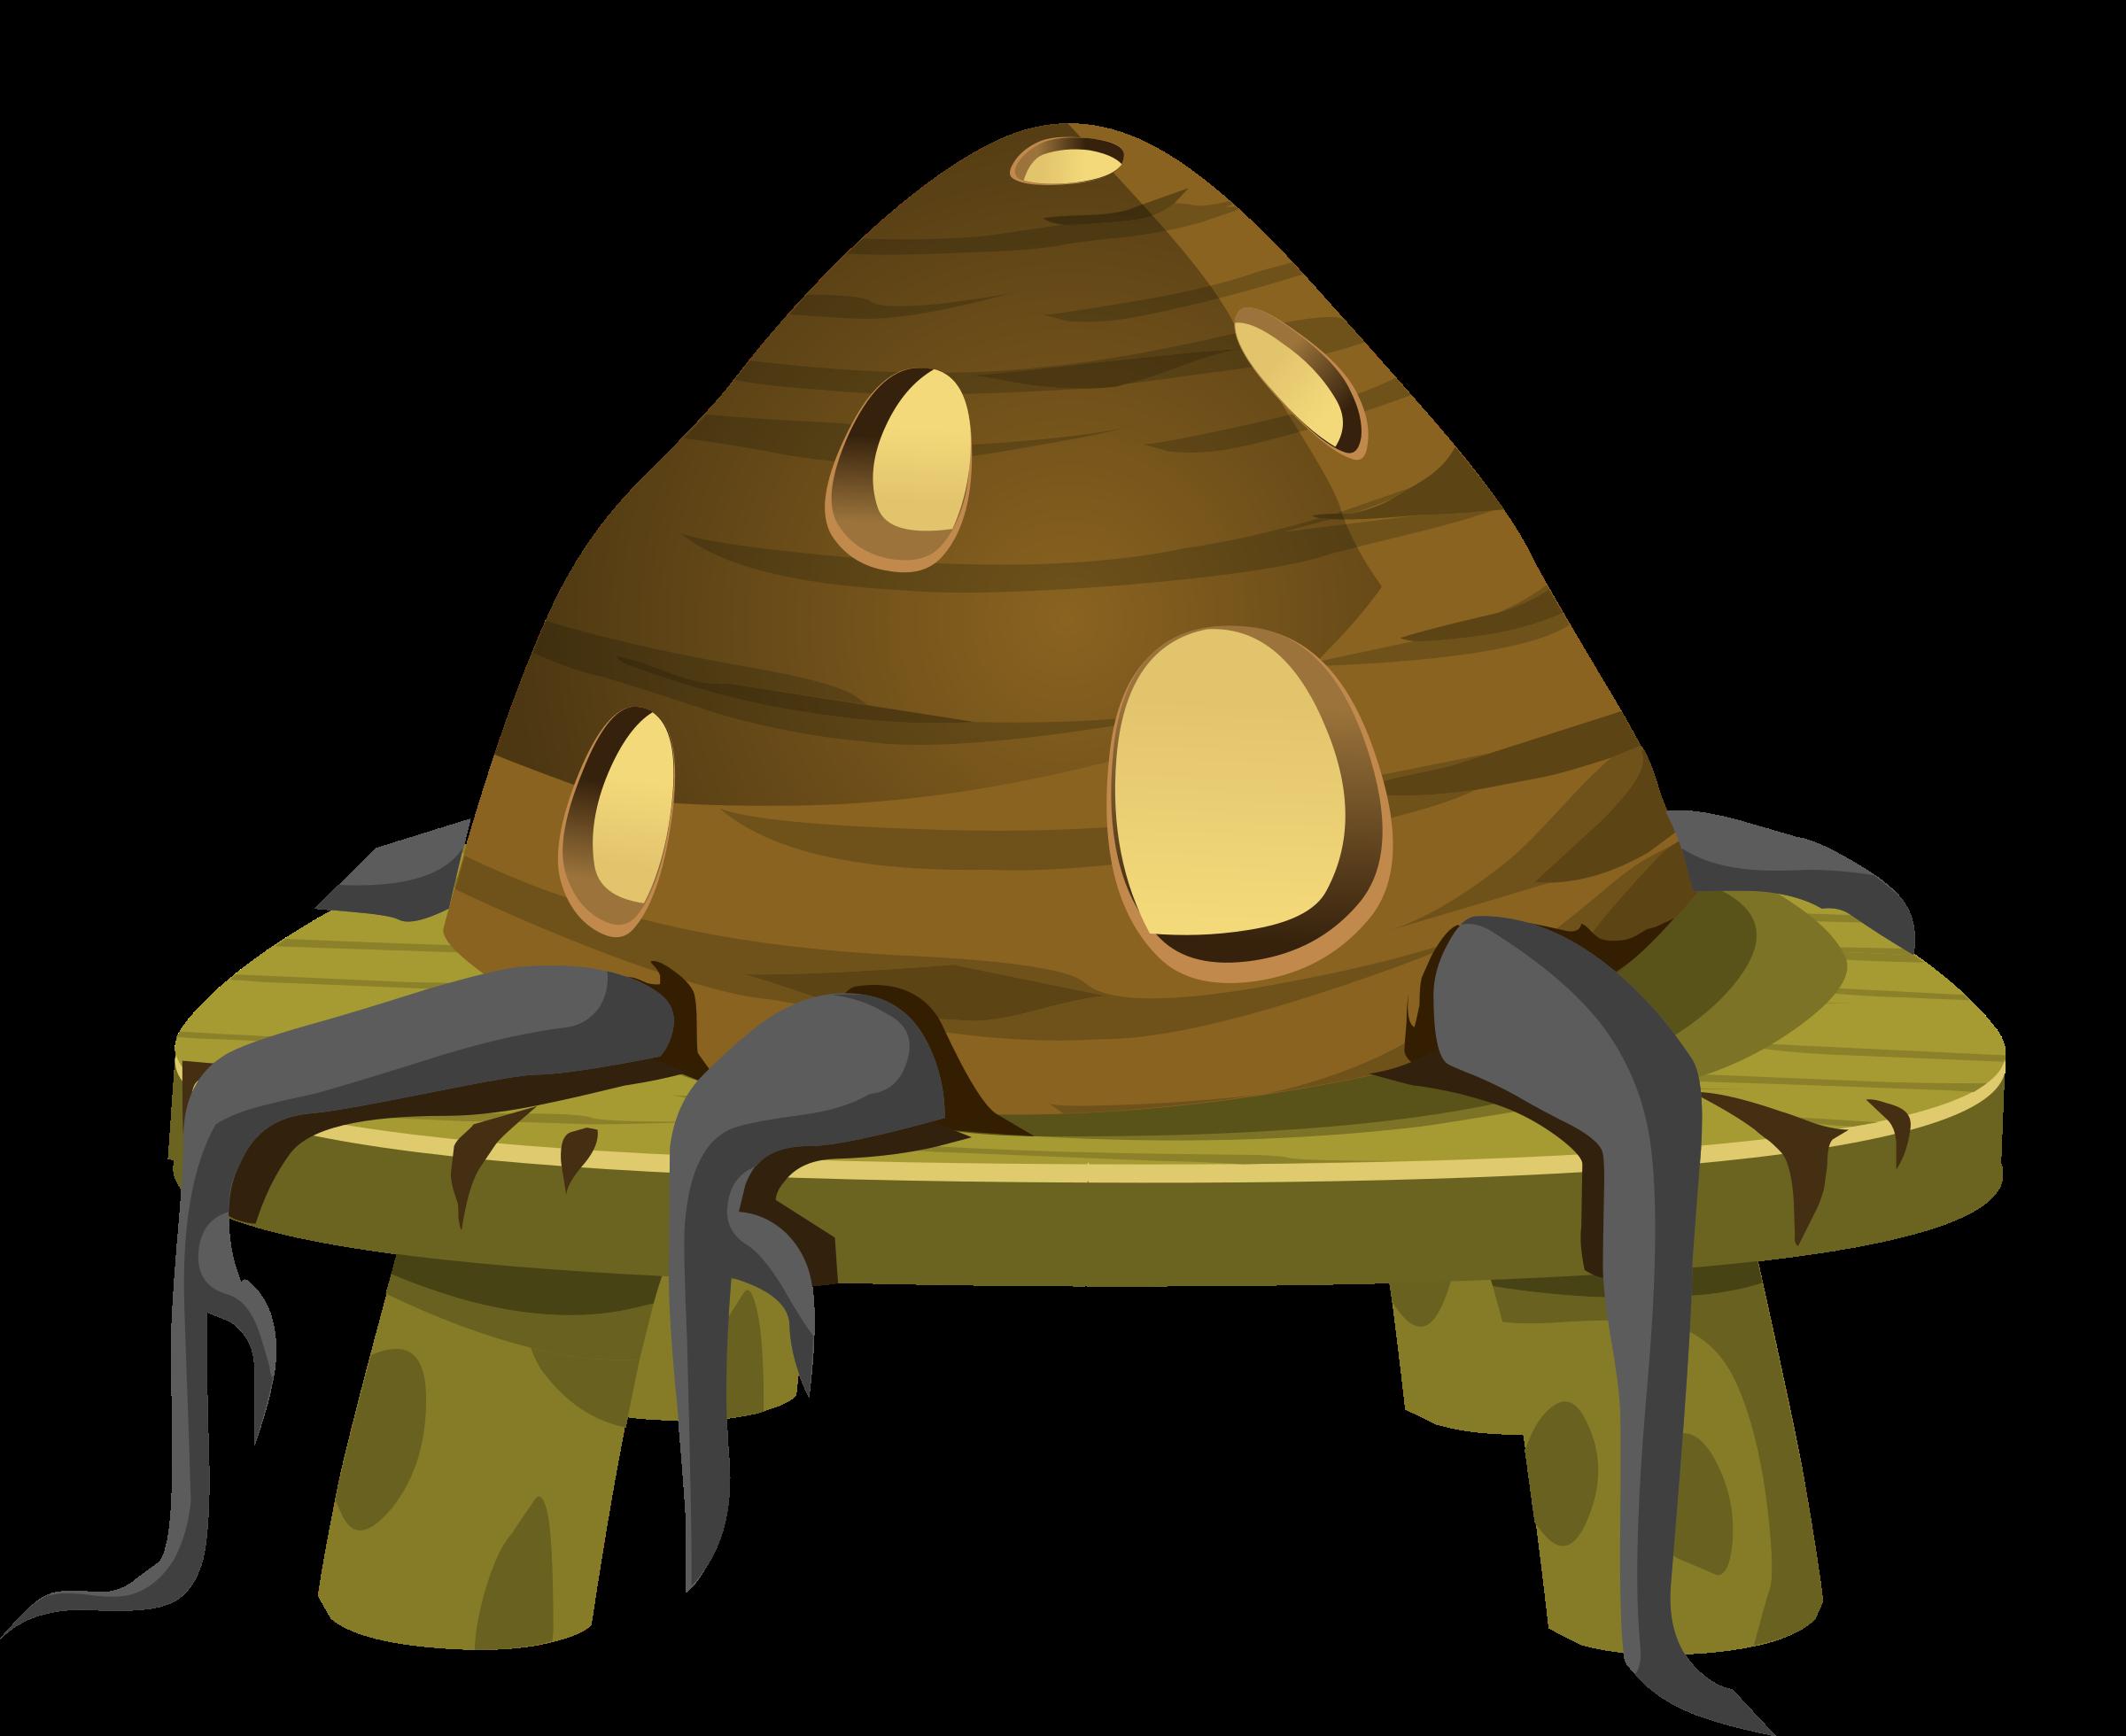 Firebog pol resource hive. Firefly clipart svg